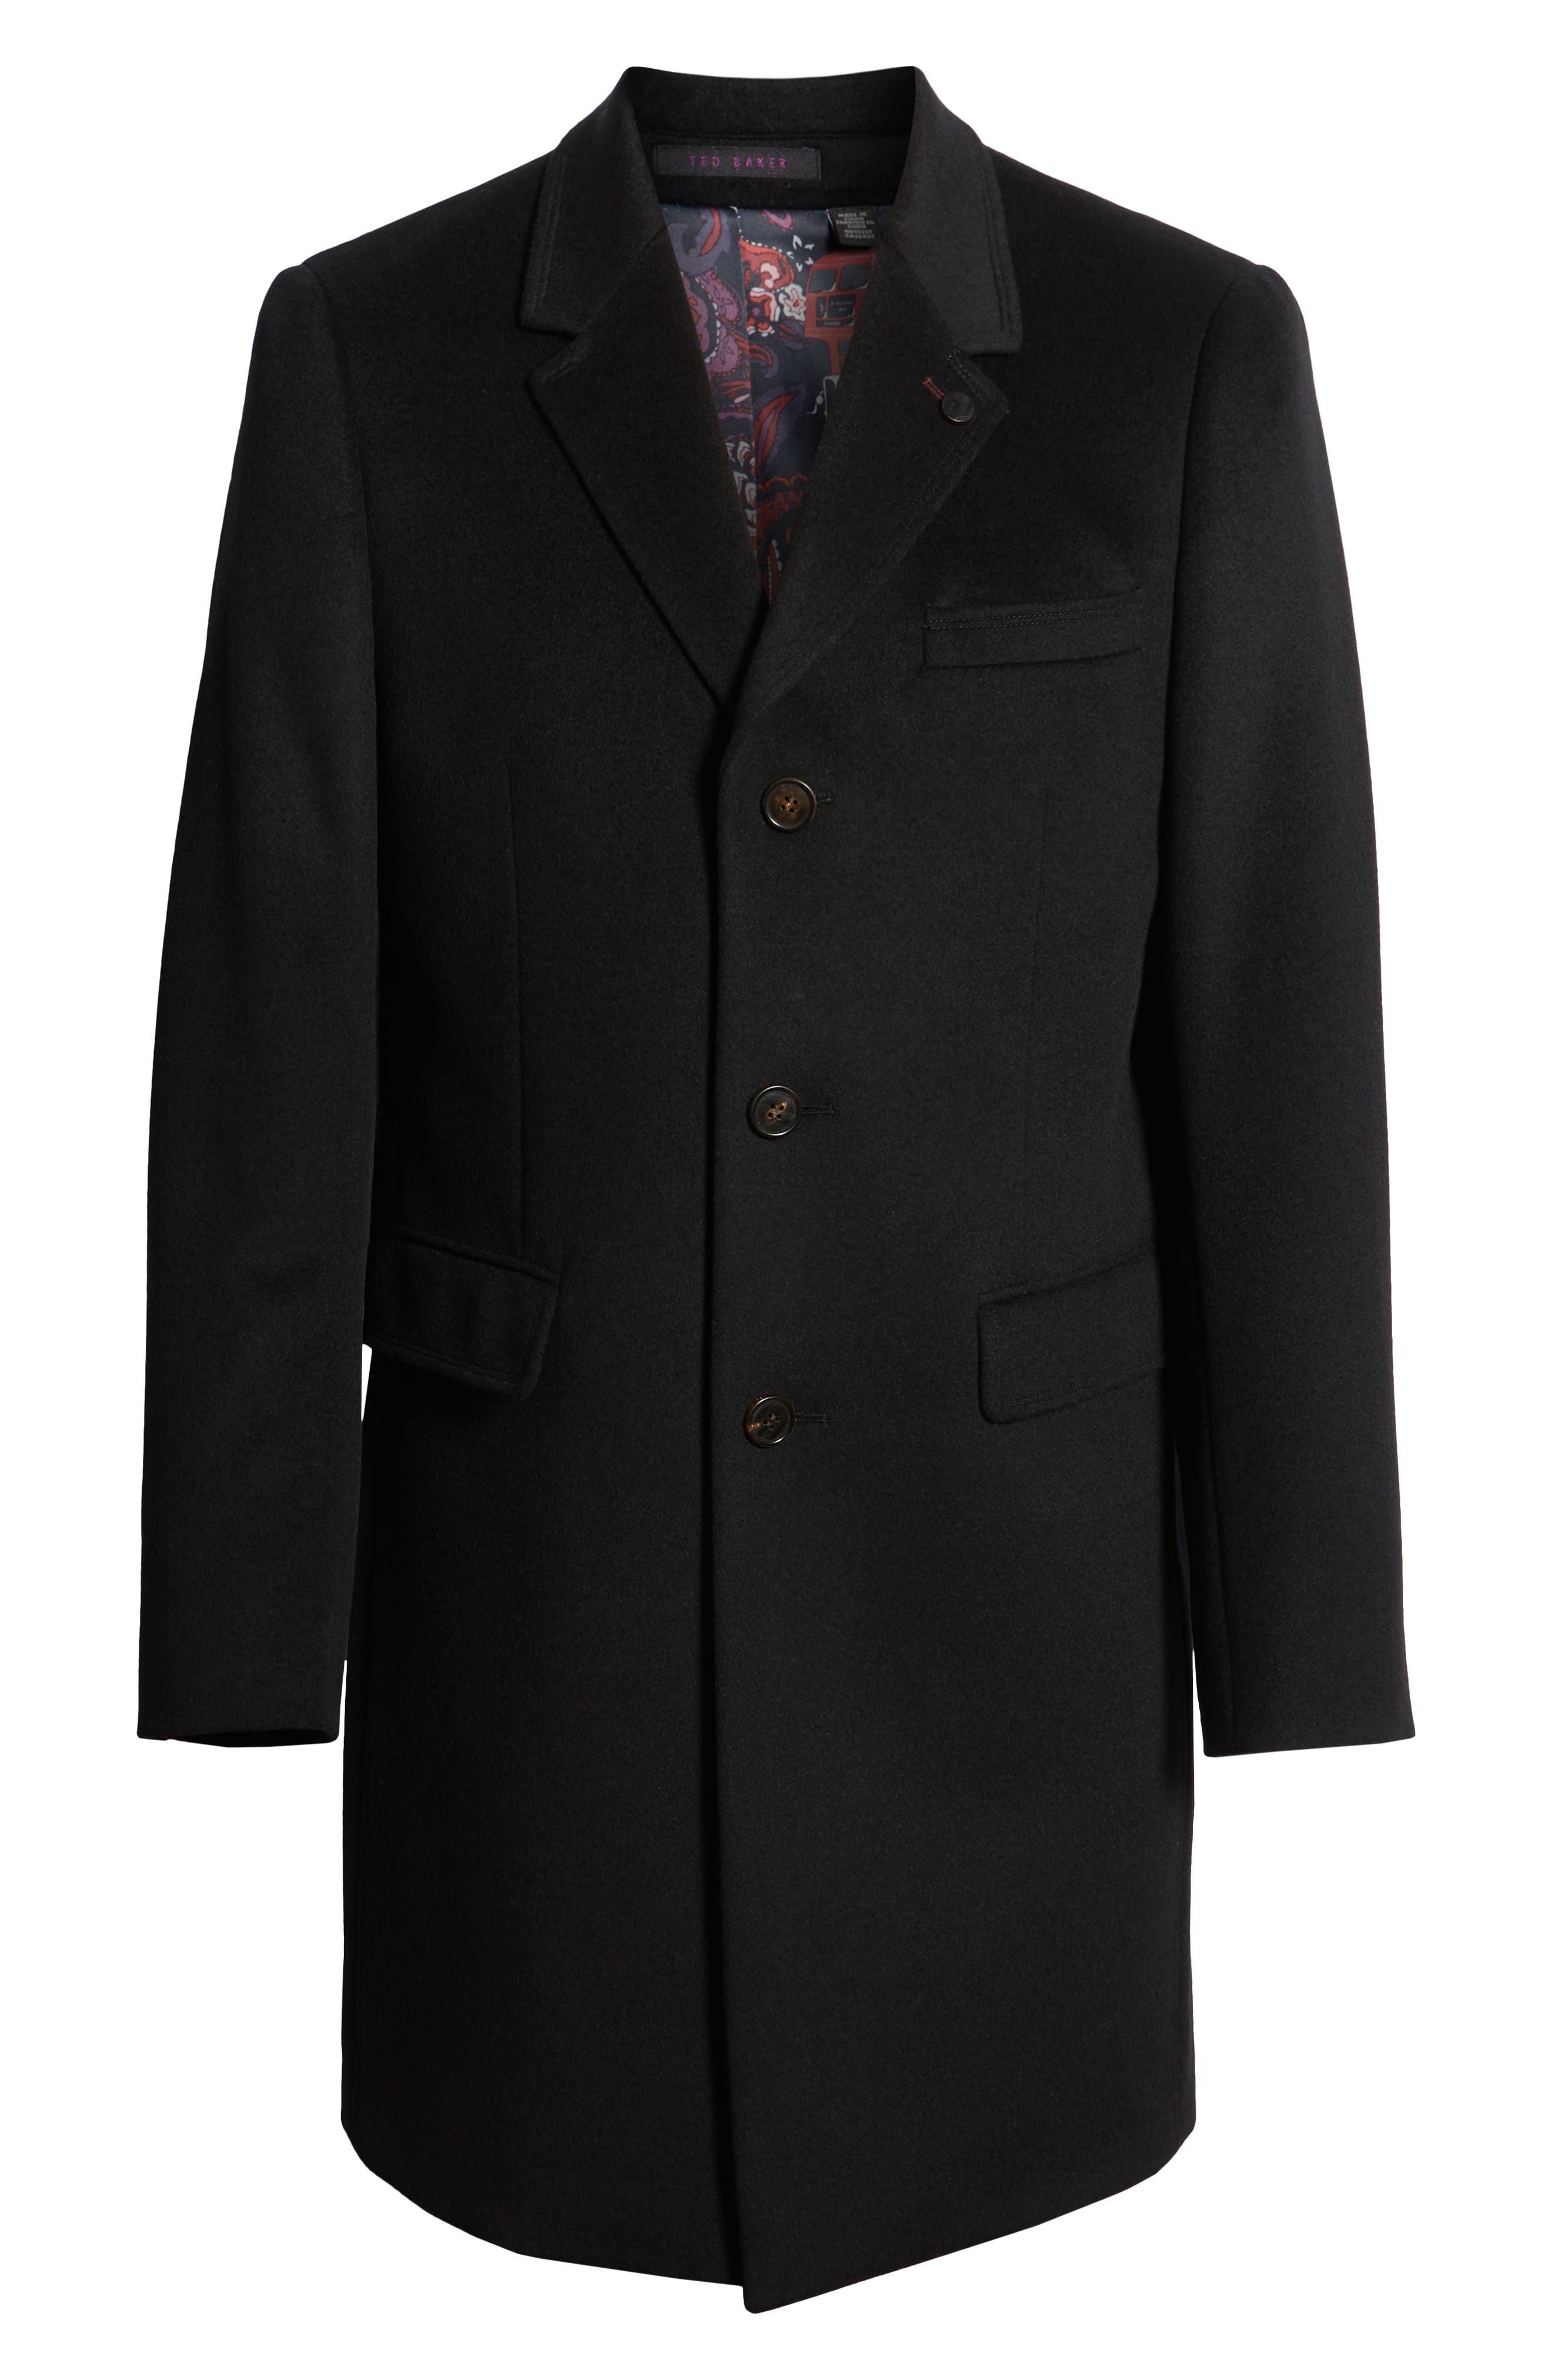 Swish Wool & Cashmere Overcoat,                             Alternate thumbnail 6, color,                             001